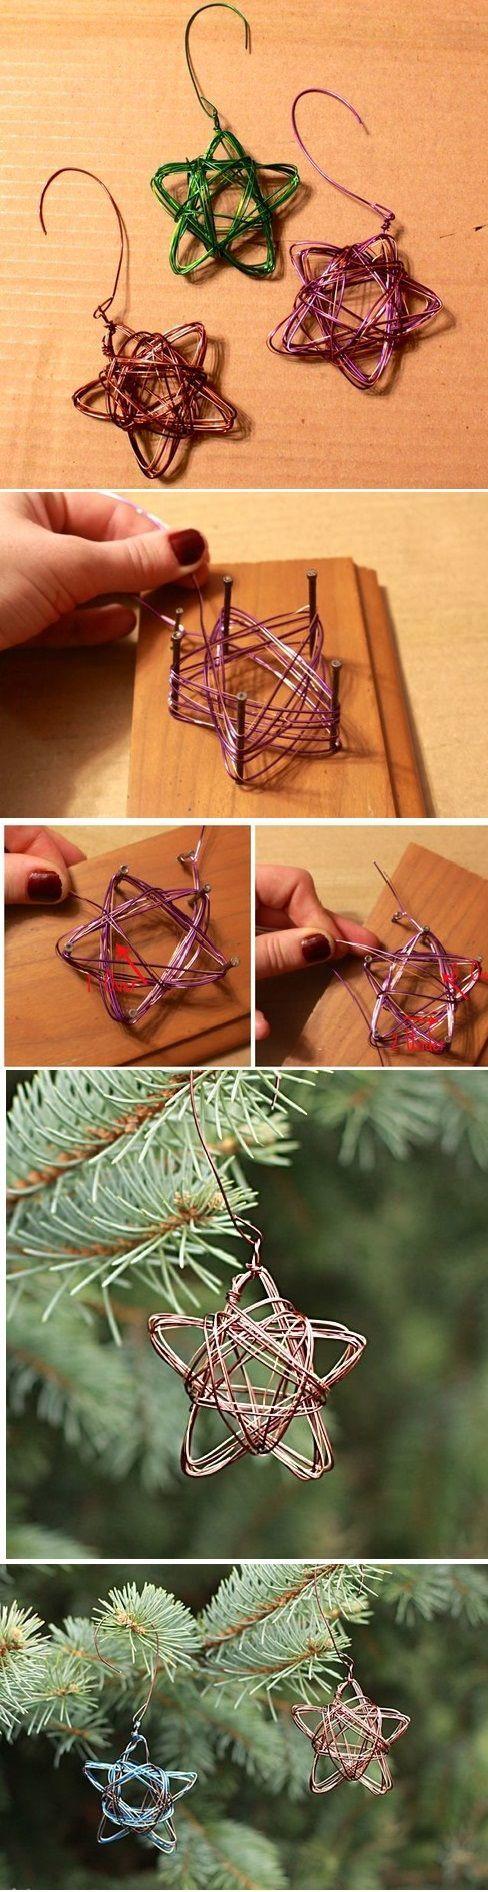 Handmade Star Wire Ornament Christmas Crafts Christmas Crafts Diy Diy Christmas Ornaments